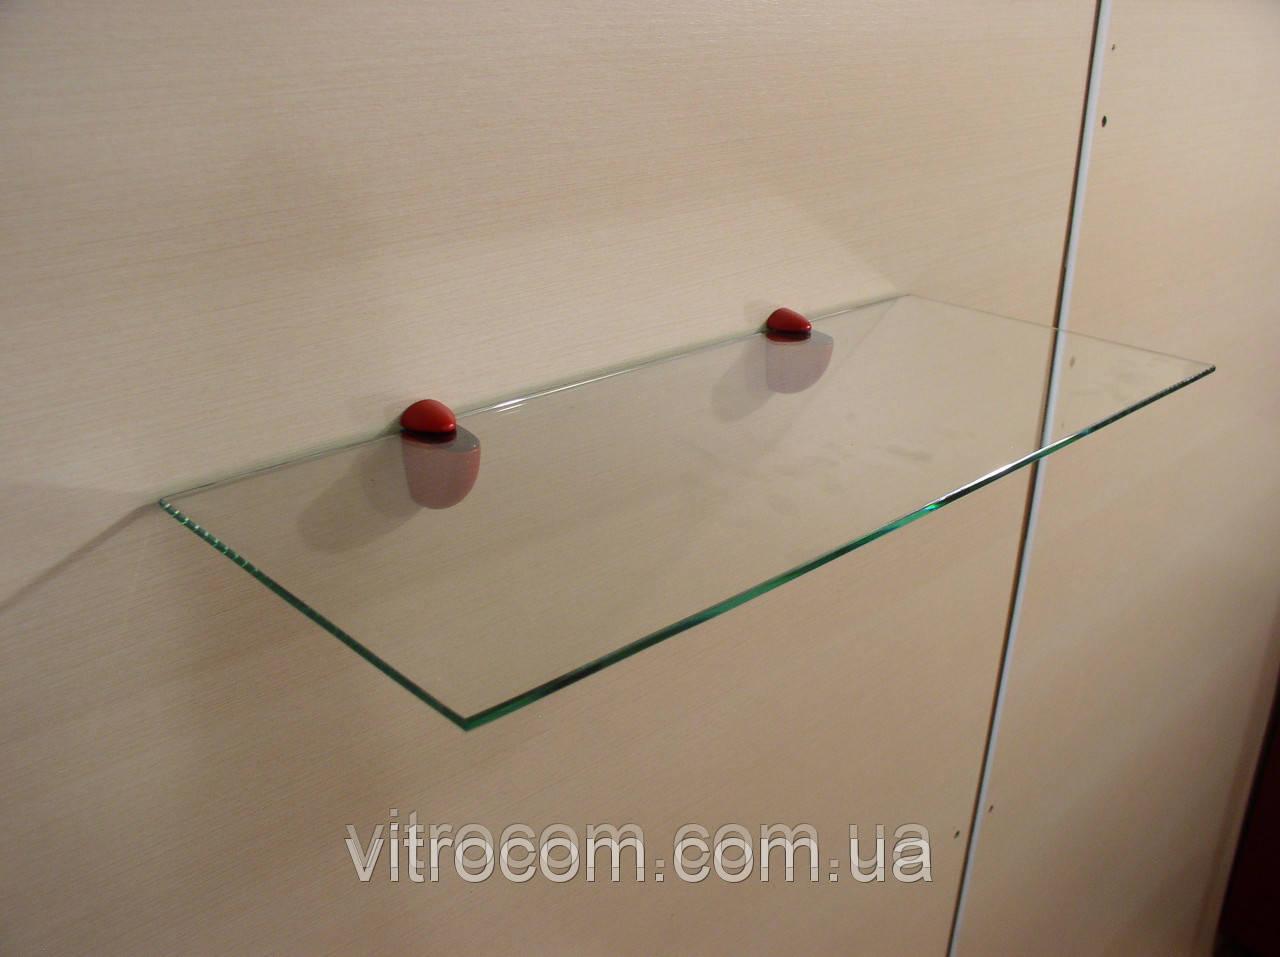 Полка стеклянная прямая 5 мм прозрачная 40 х 15 см